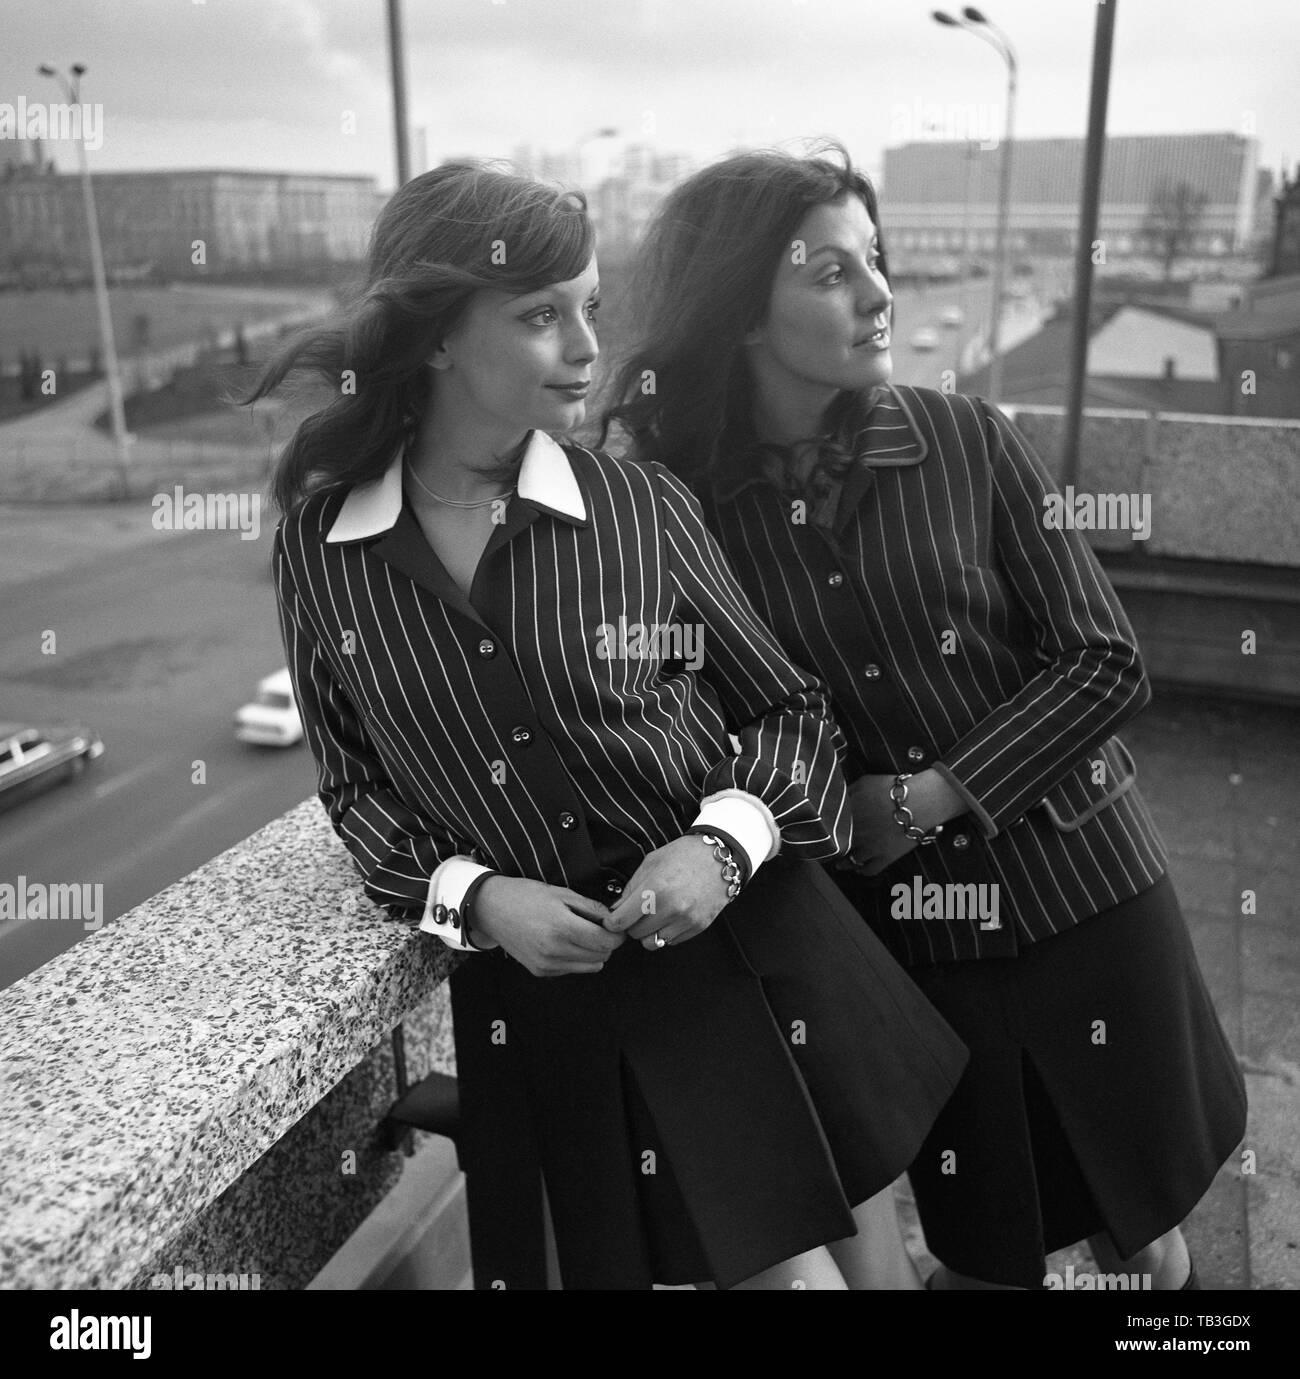 048e5bb73d9 07.07.1971, Berlin, Berlin, GDR - Young women wear the latest autumn  fashion in the city. 00S710707D016CAROEX.JPG [MODEL RELEASE: NO, PROPERTY  RELEASE